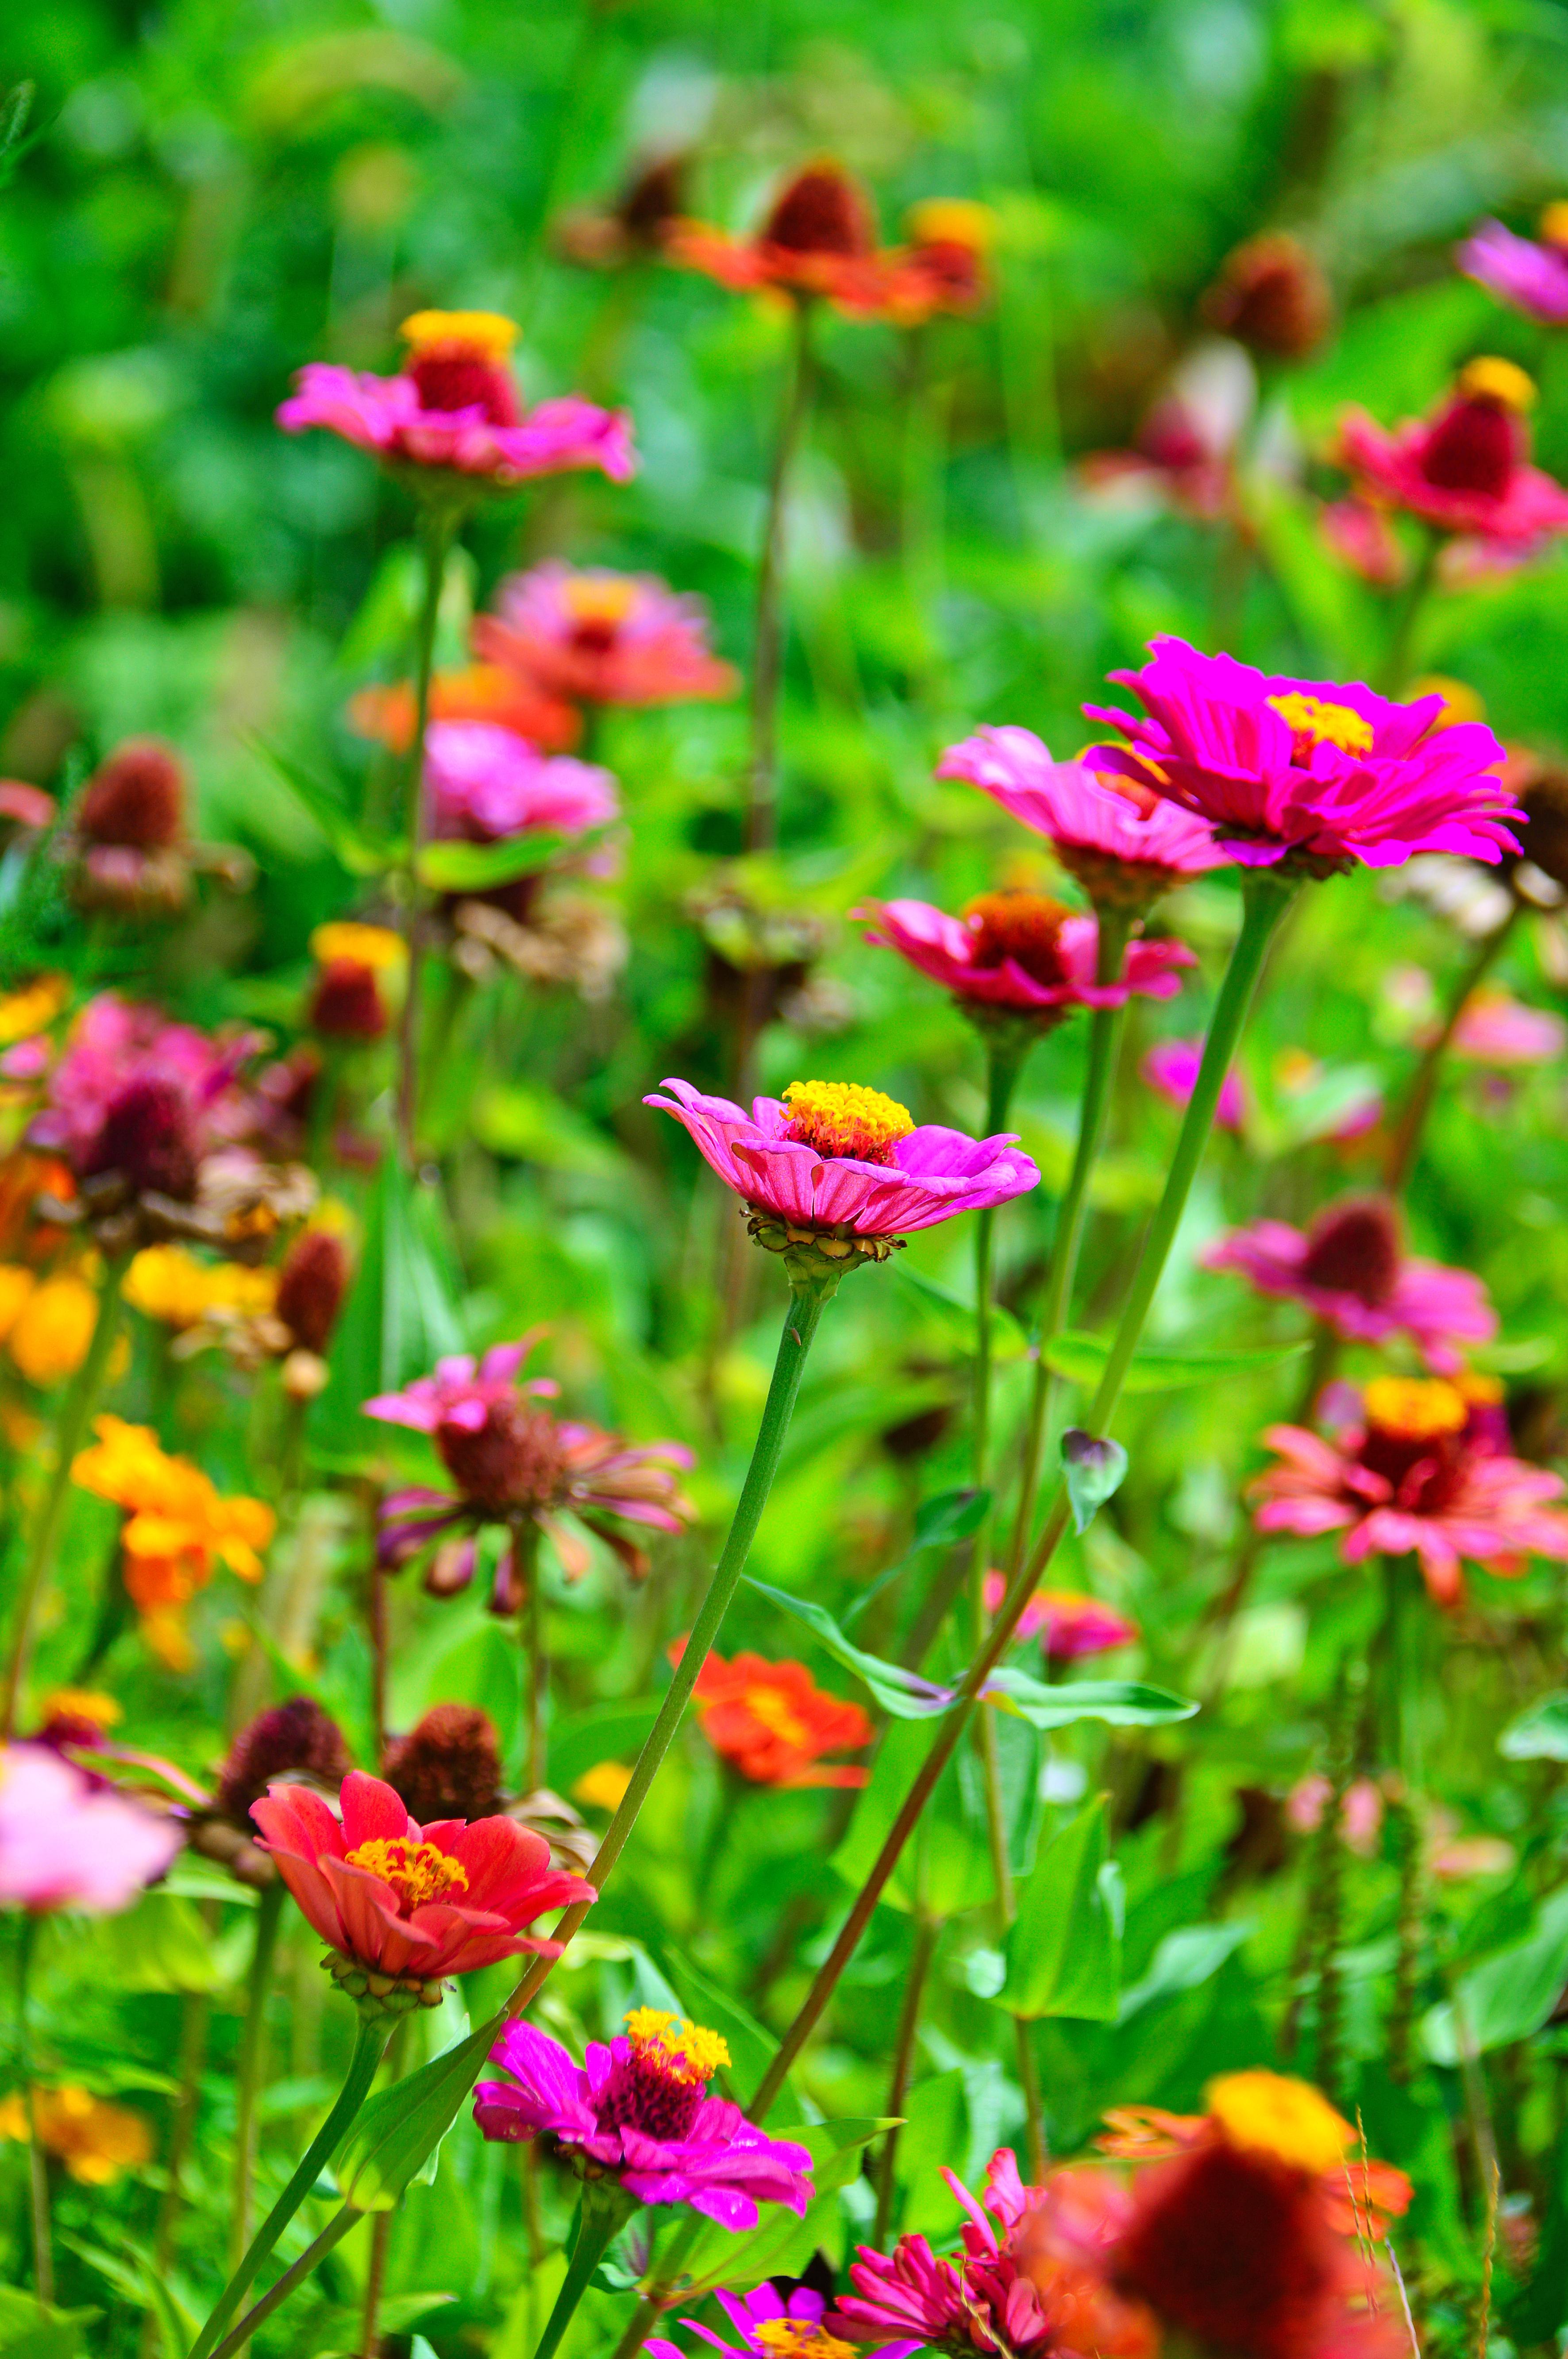 Flower Wildflower Flora Plant Spring Petal Gr Annual Meadow Garden Cosmos Flowering Stem